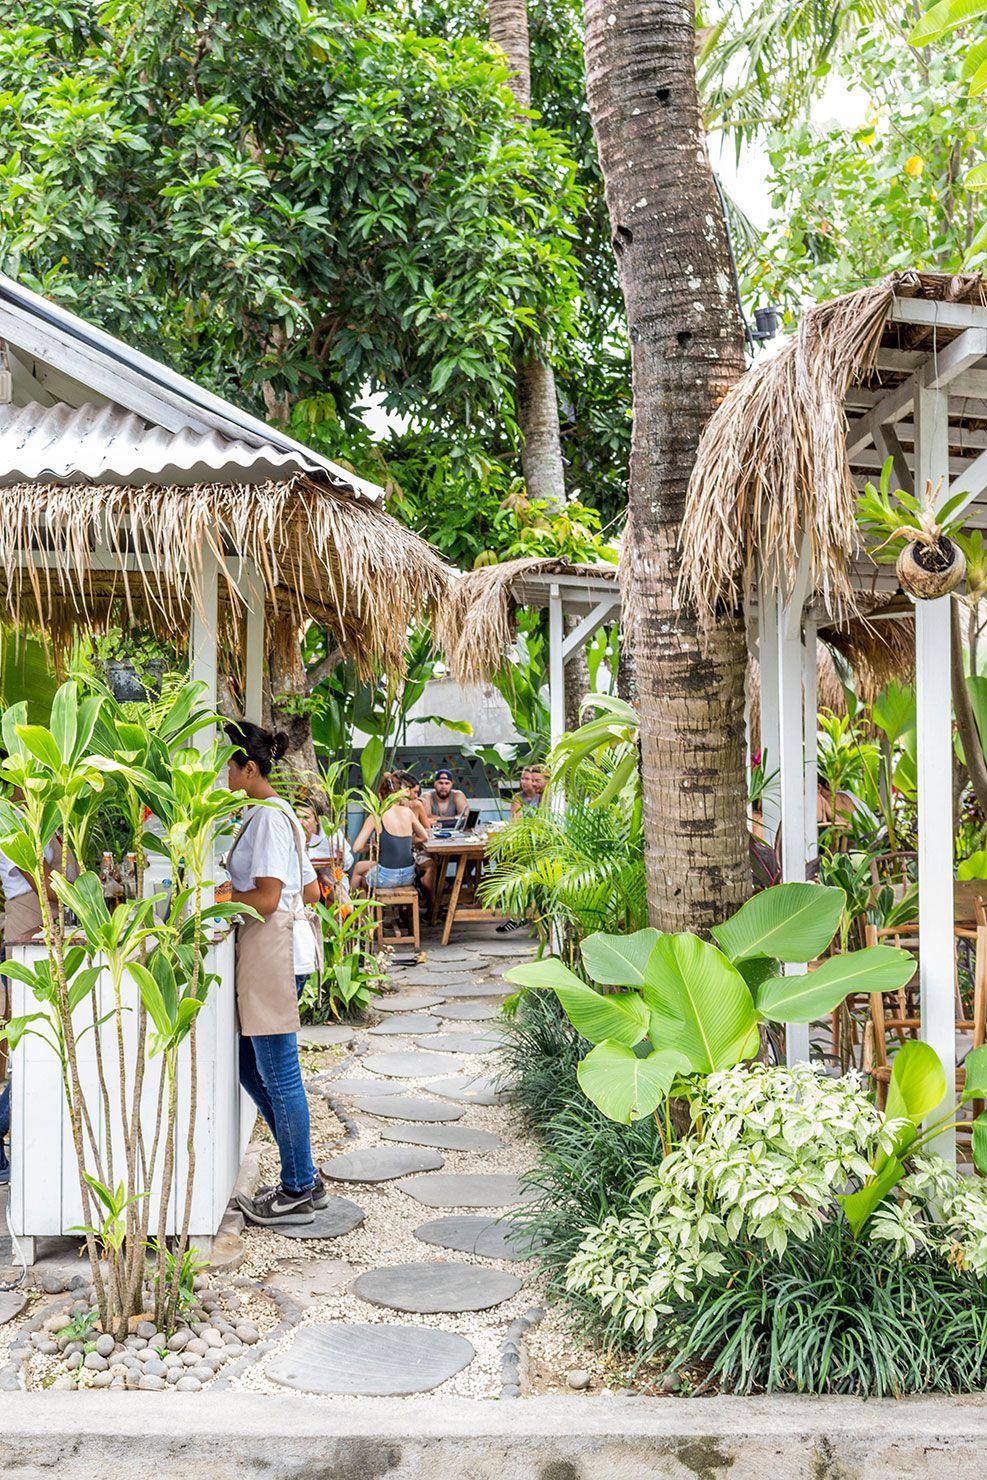 Best Cafes In Bali Bali Interiors Outdoor Restaurant Design Outdoor Cafe Outdoor Restaurant Patio Backyard garden healthy drinks cafe